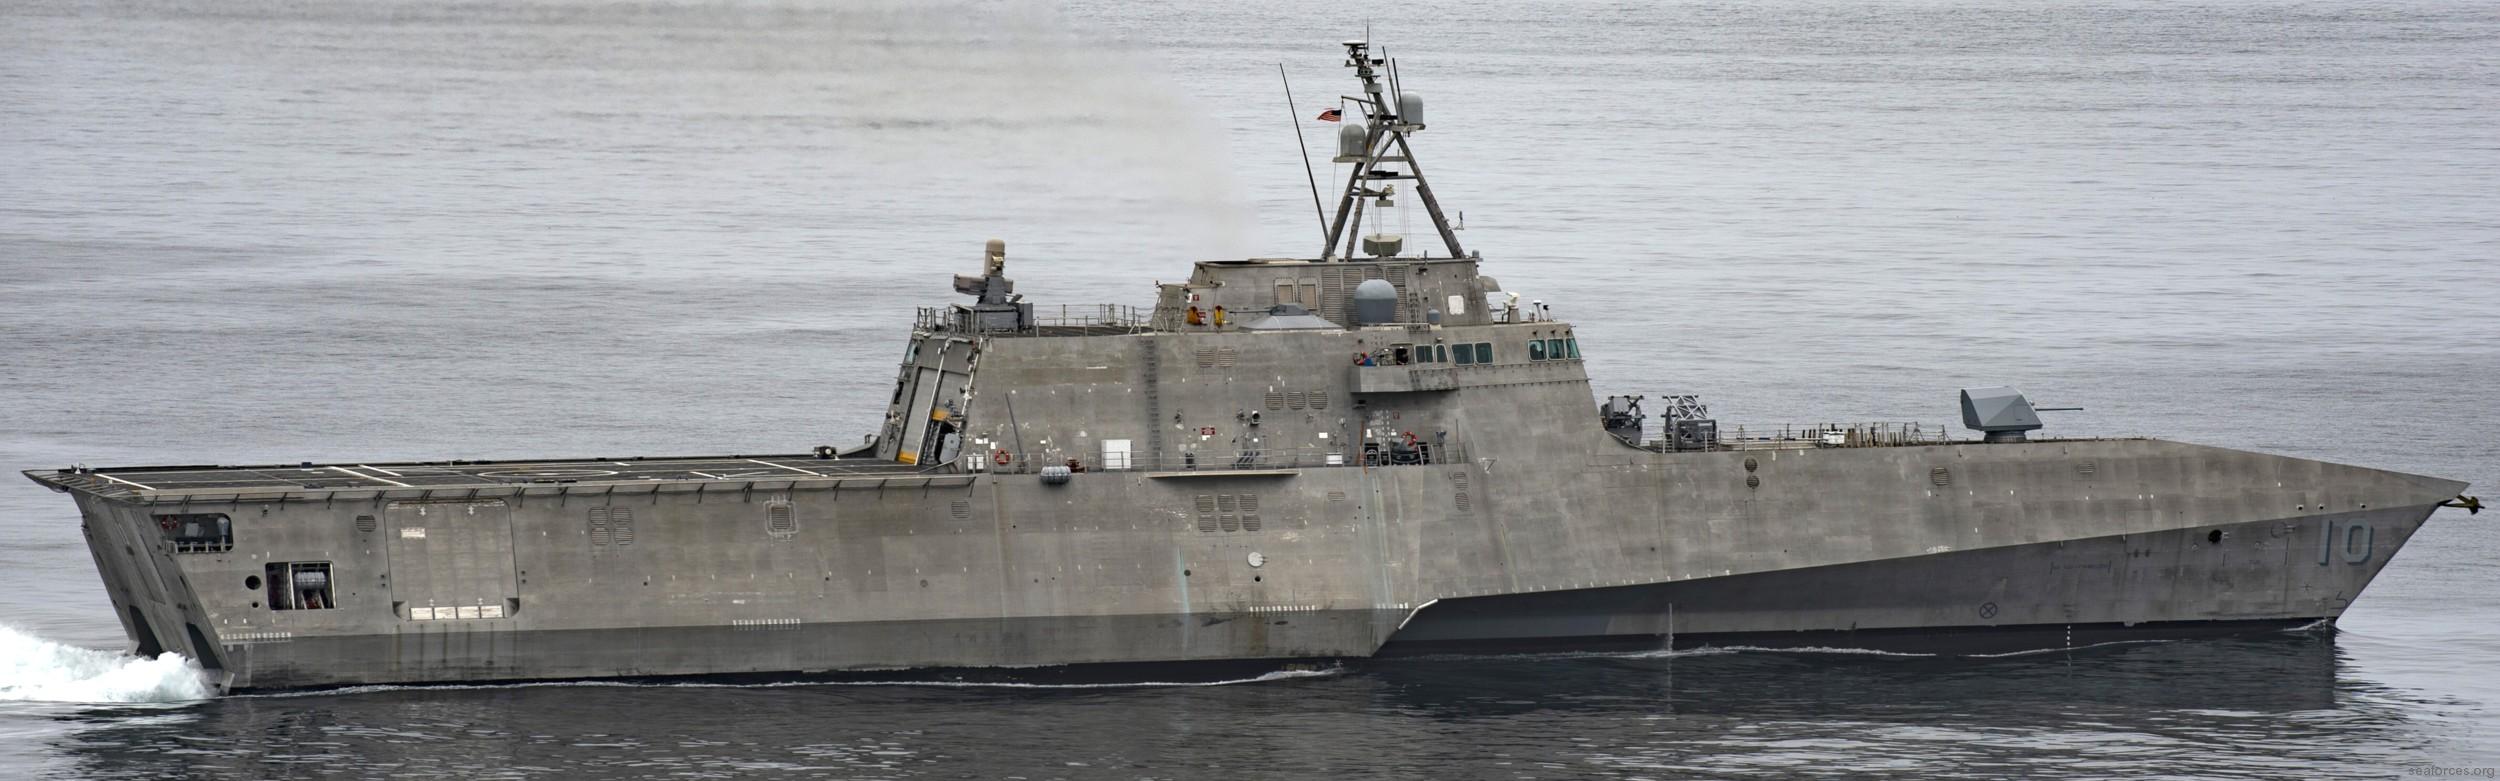 LCS-10-USS-Gabrielle-Giffords-013.jpg